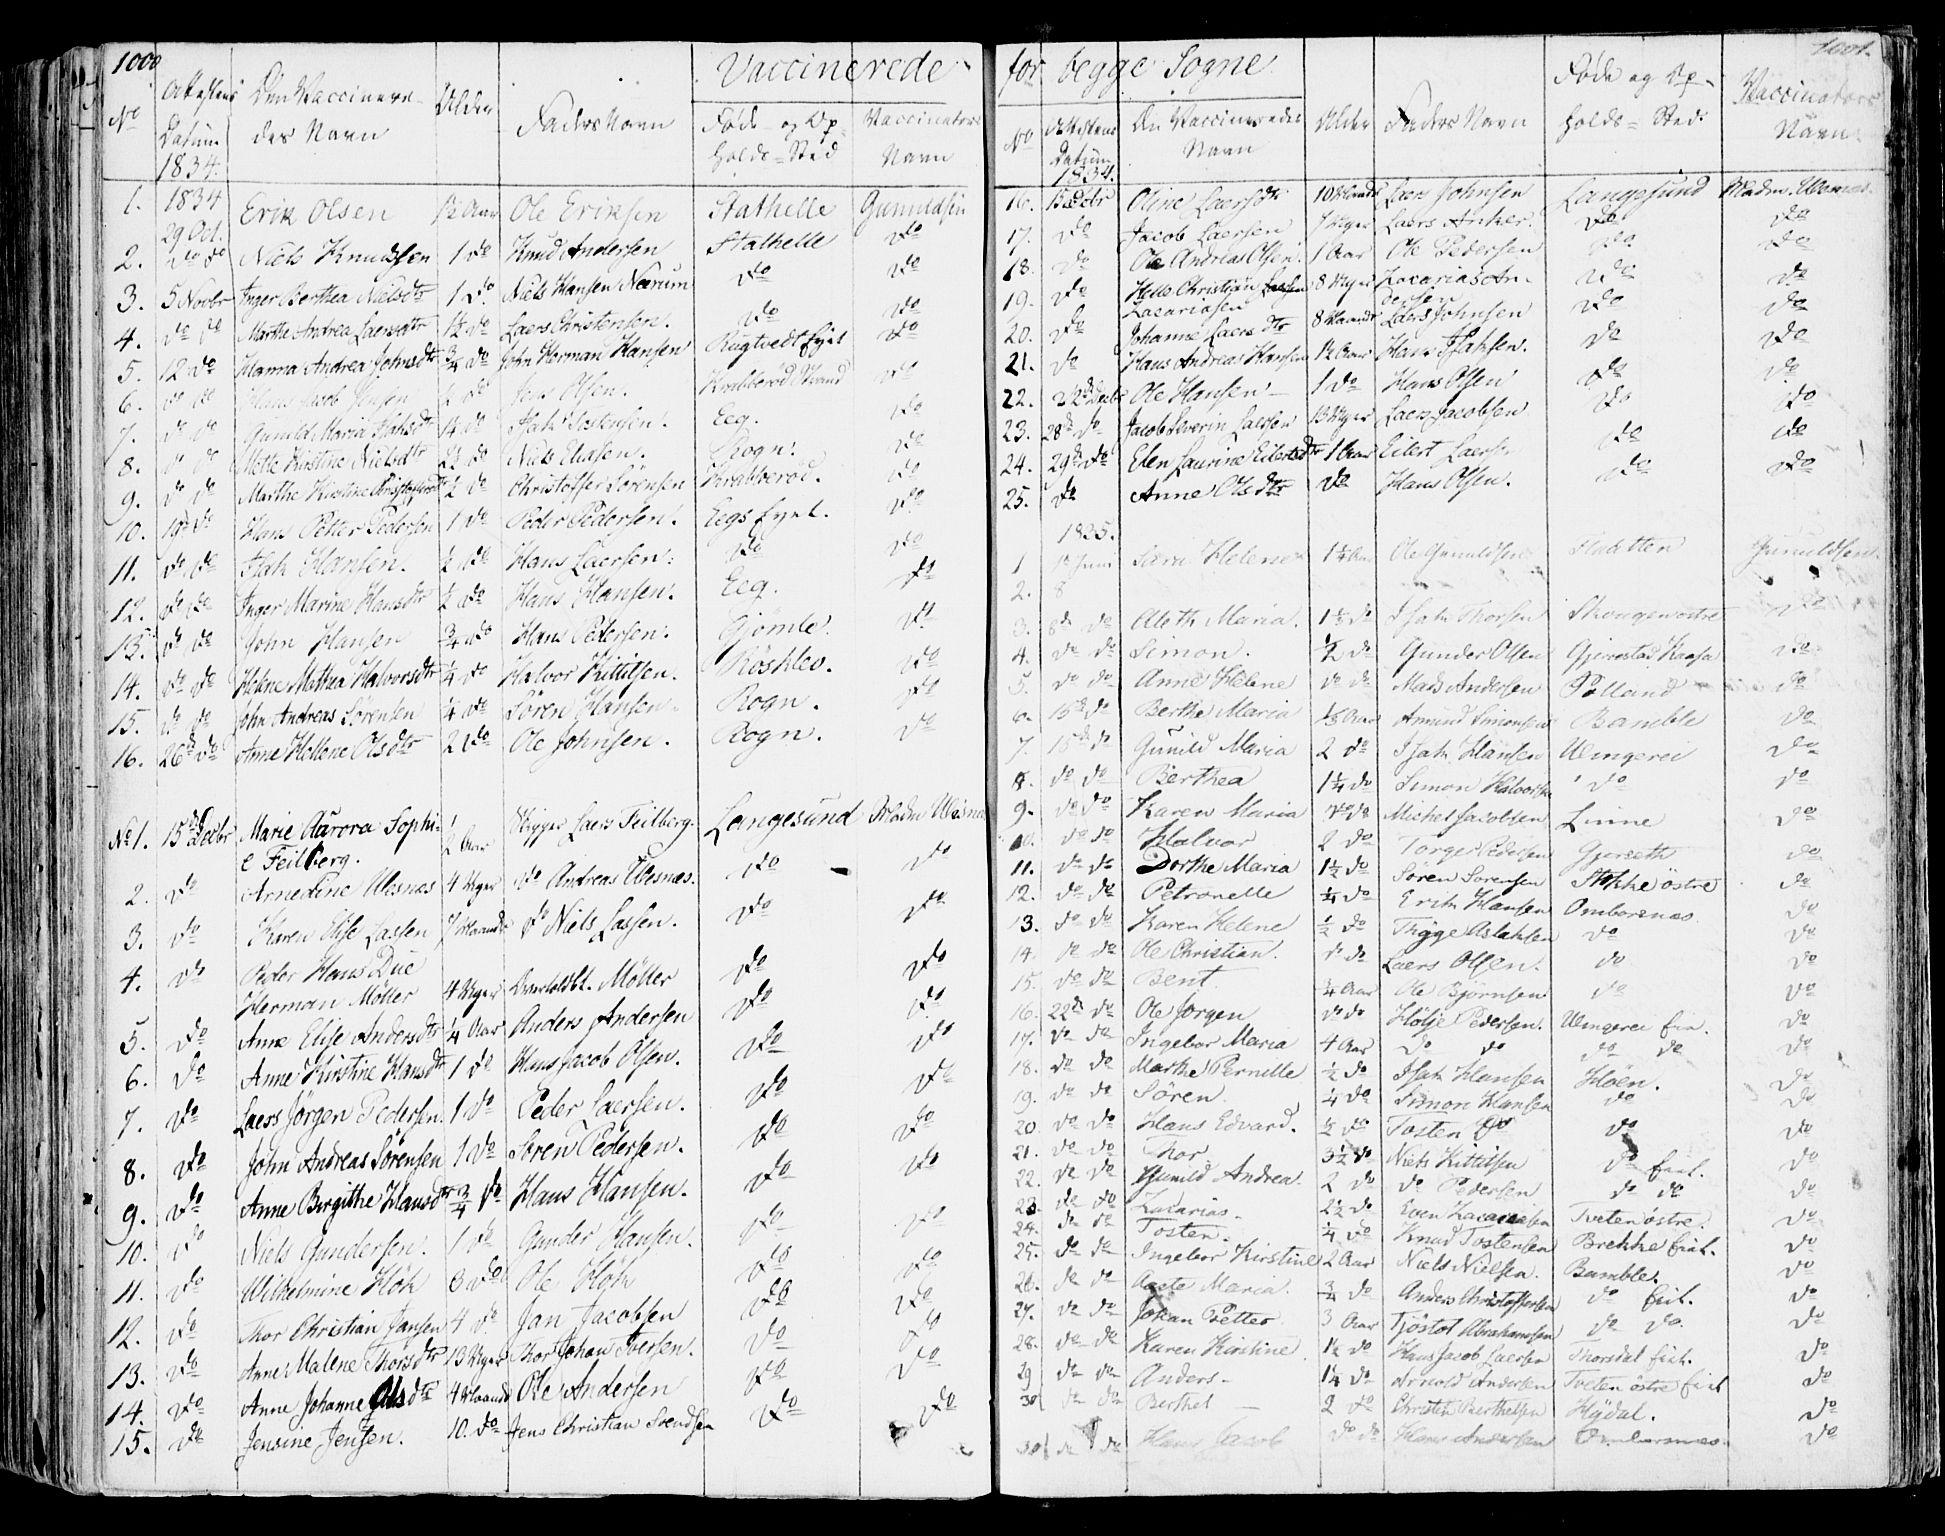 SAKO, Bamble kirkebøker, F/Fa/L0004: Ministerialbok nr. I 4, 1834-1853, s. 1000-1001